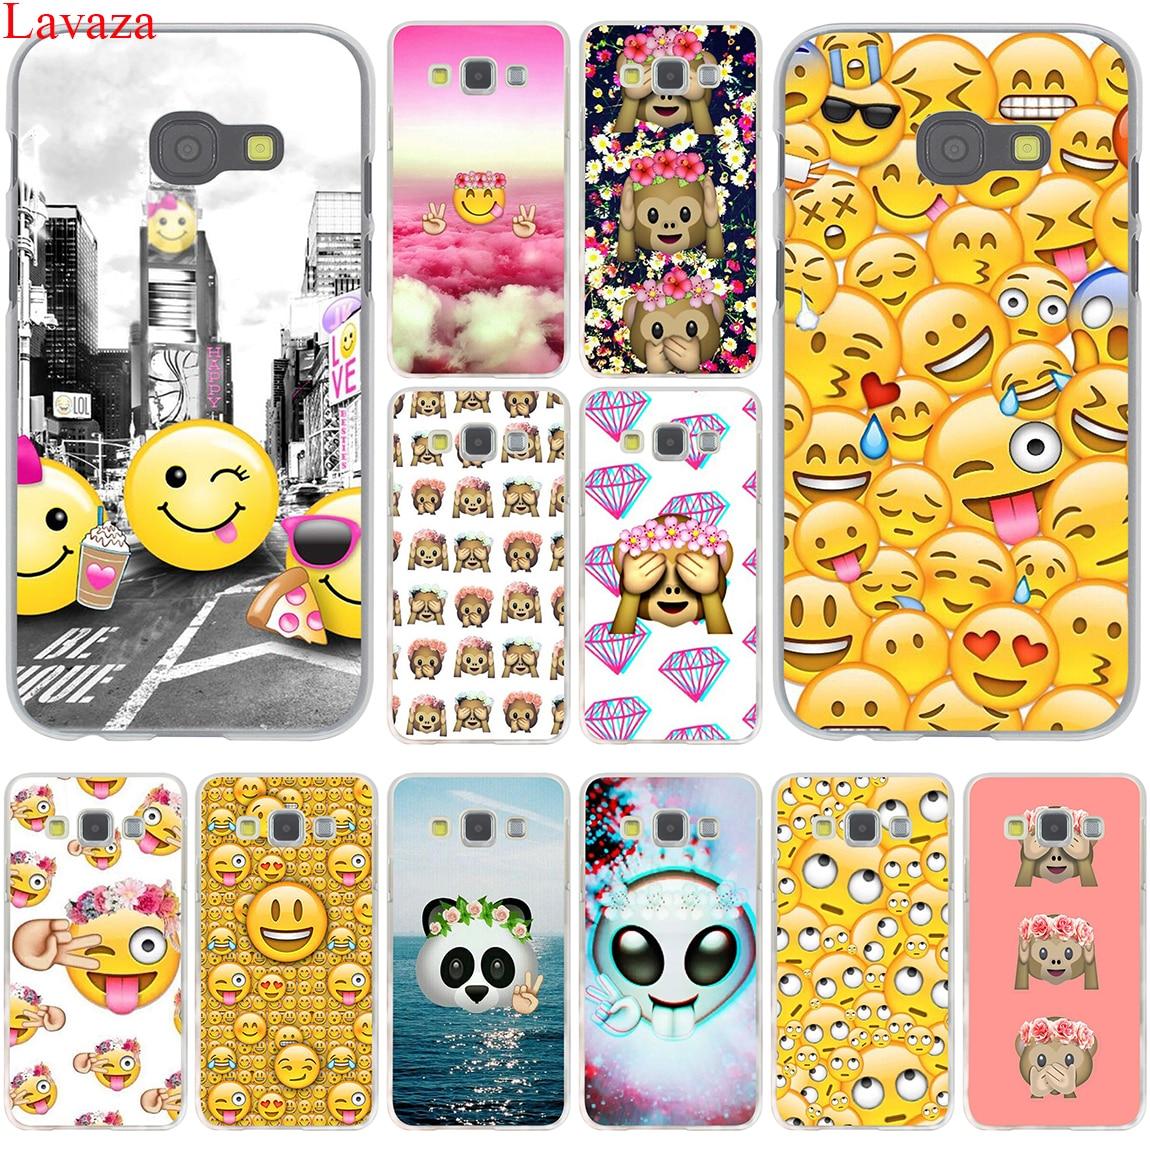 lavaza smile coque alien emoji happy hard case cover for. Black Bedroom Furniture Sets. Home Design Ideas